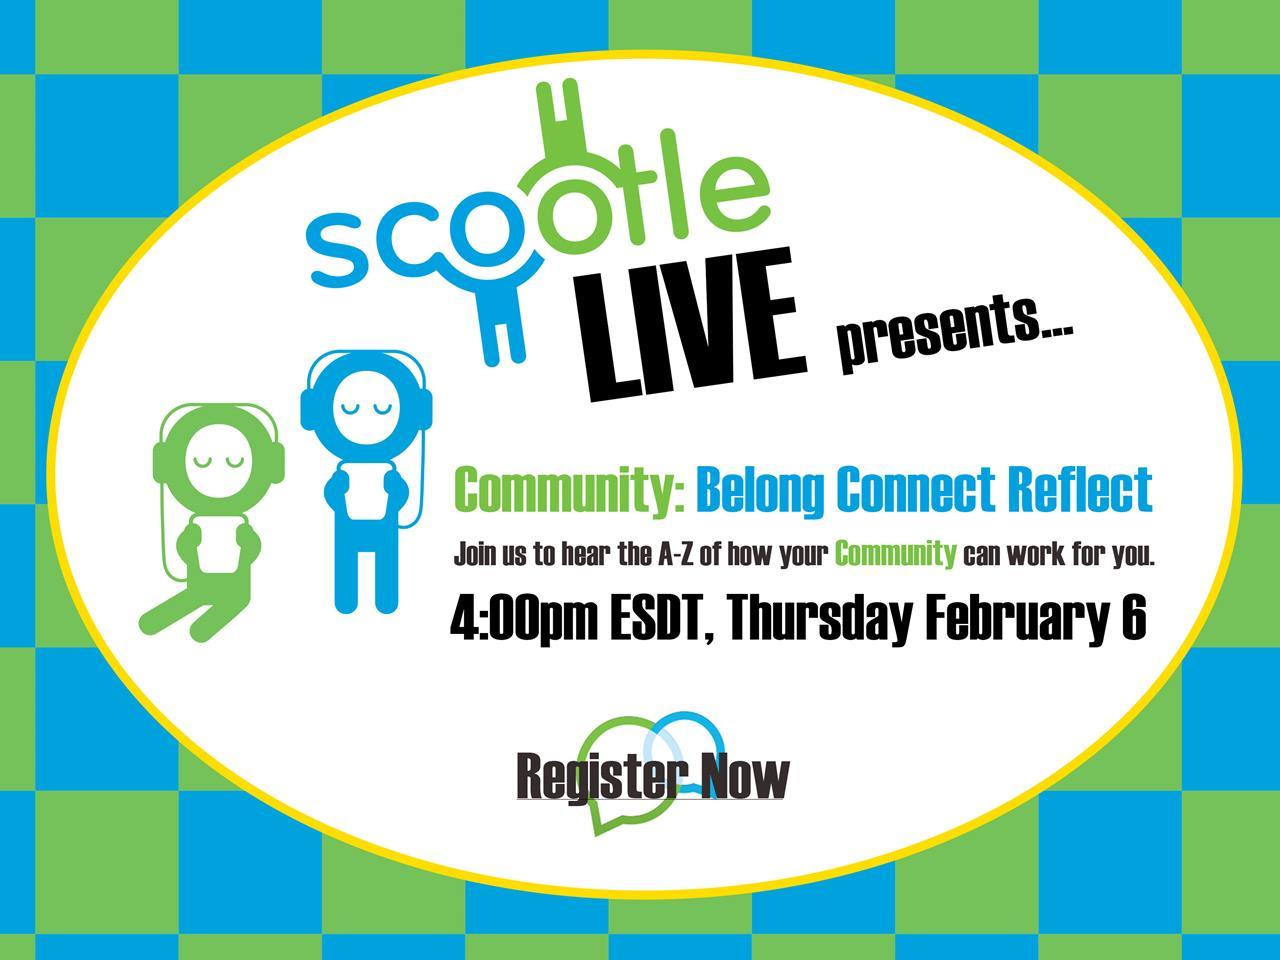 Scootle Live Webinar Series